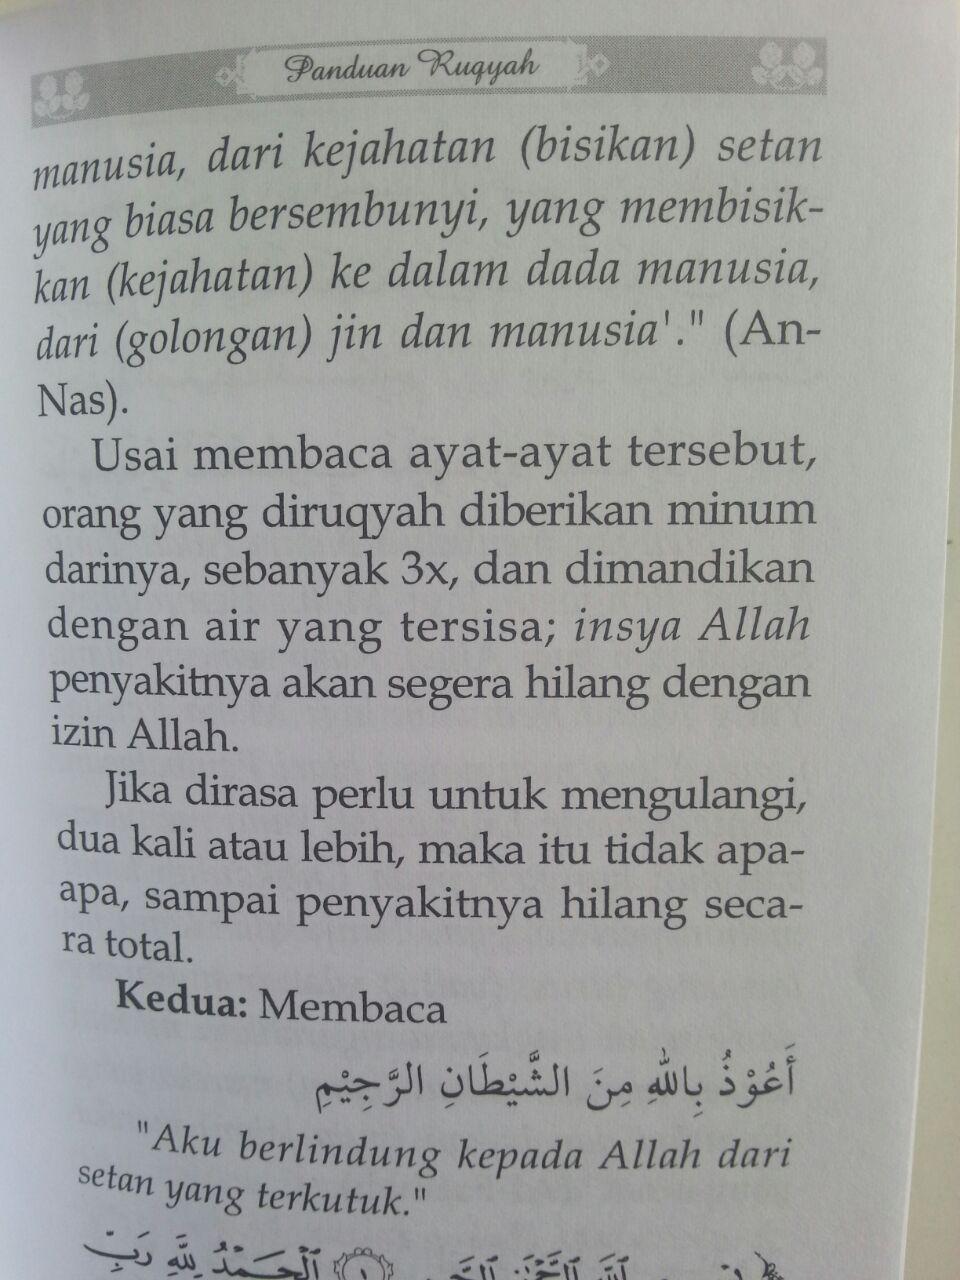 Buku Saku Panduan Praktis Ruqyah Sesuai Al-Quran As-Sunnah isi